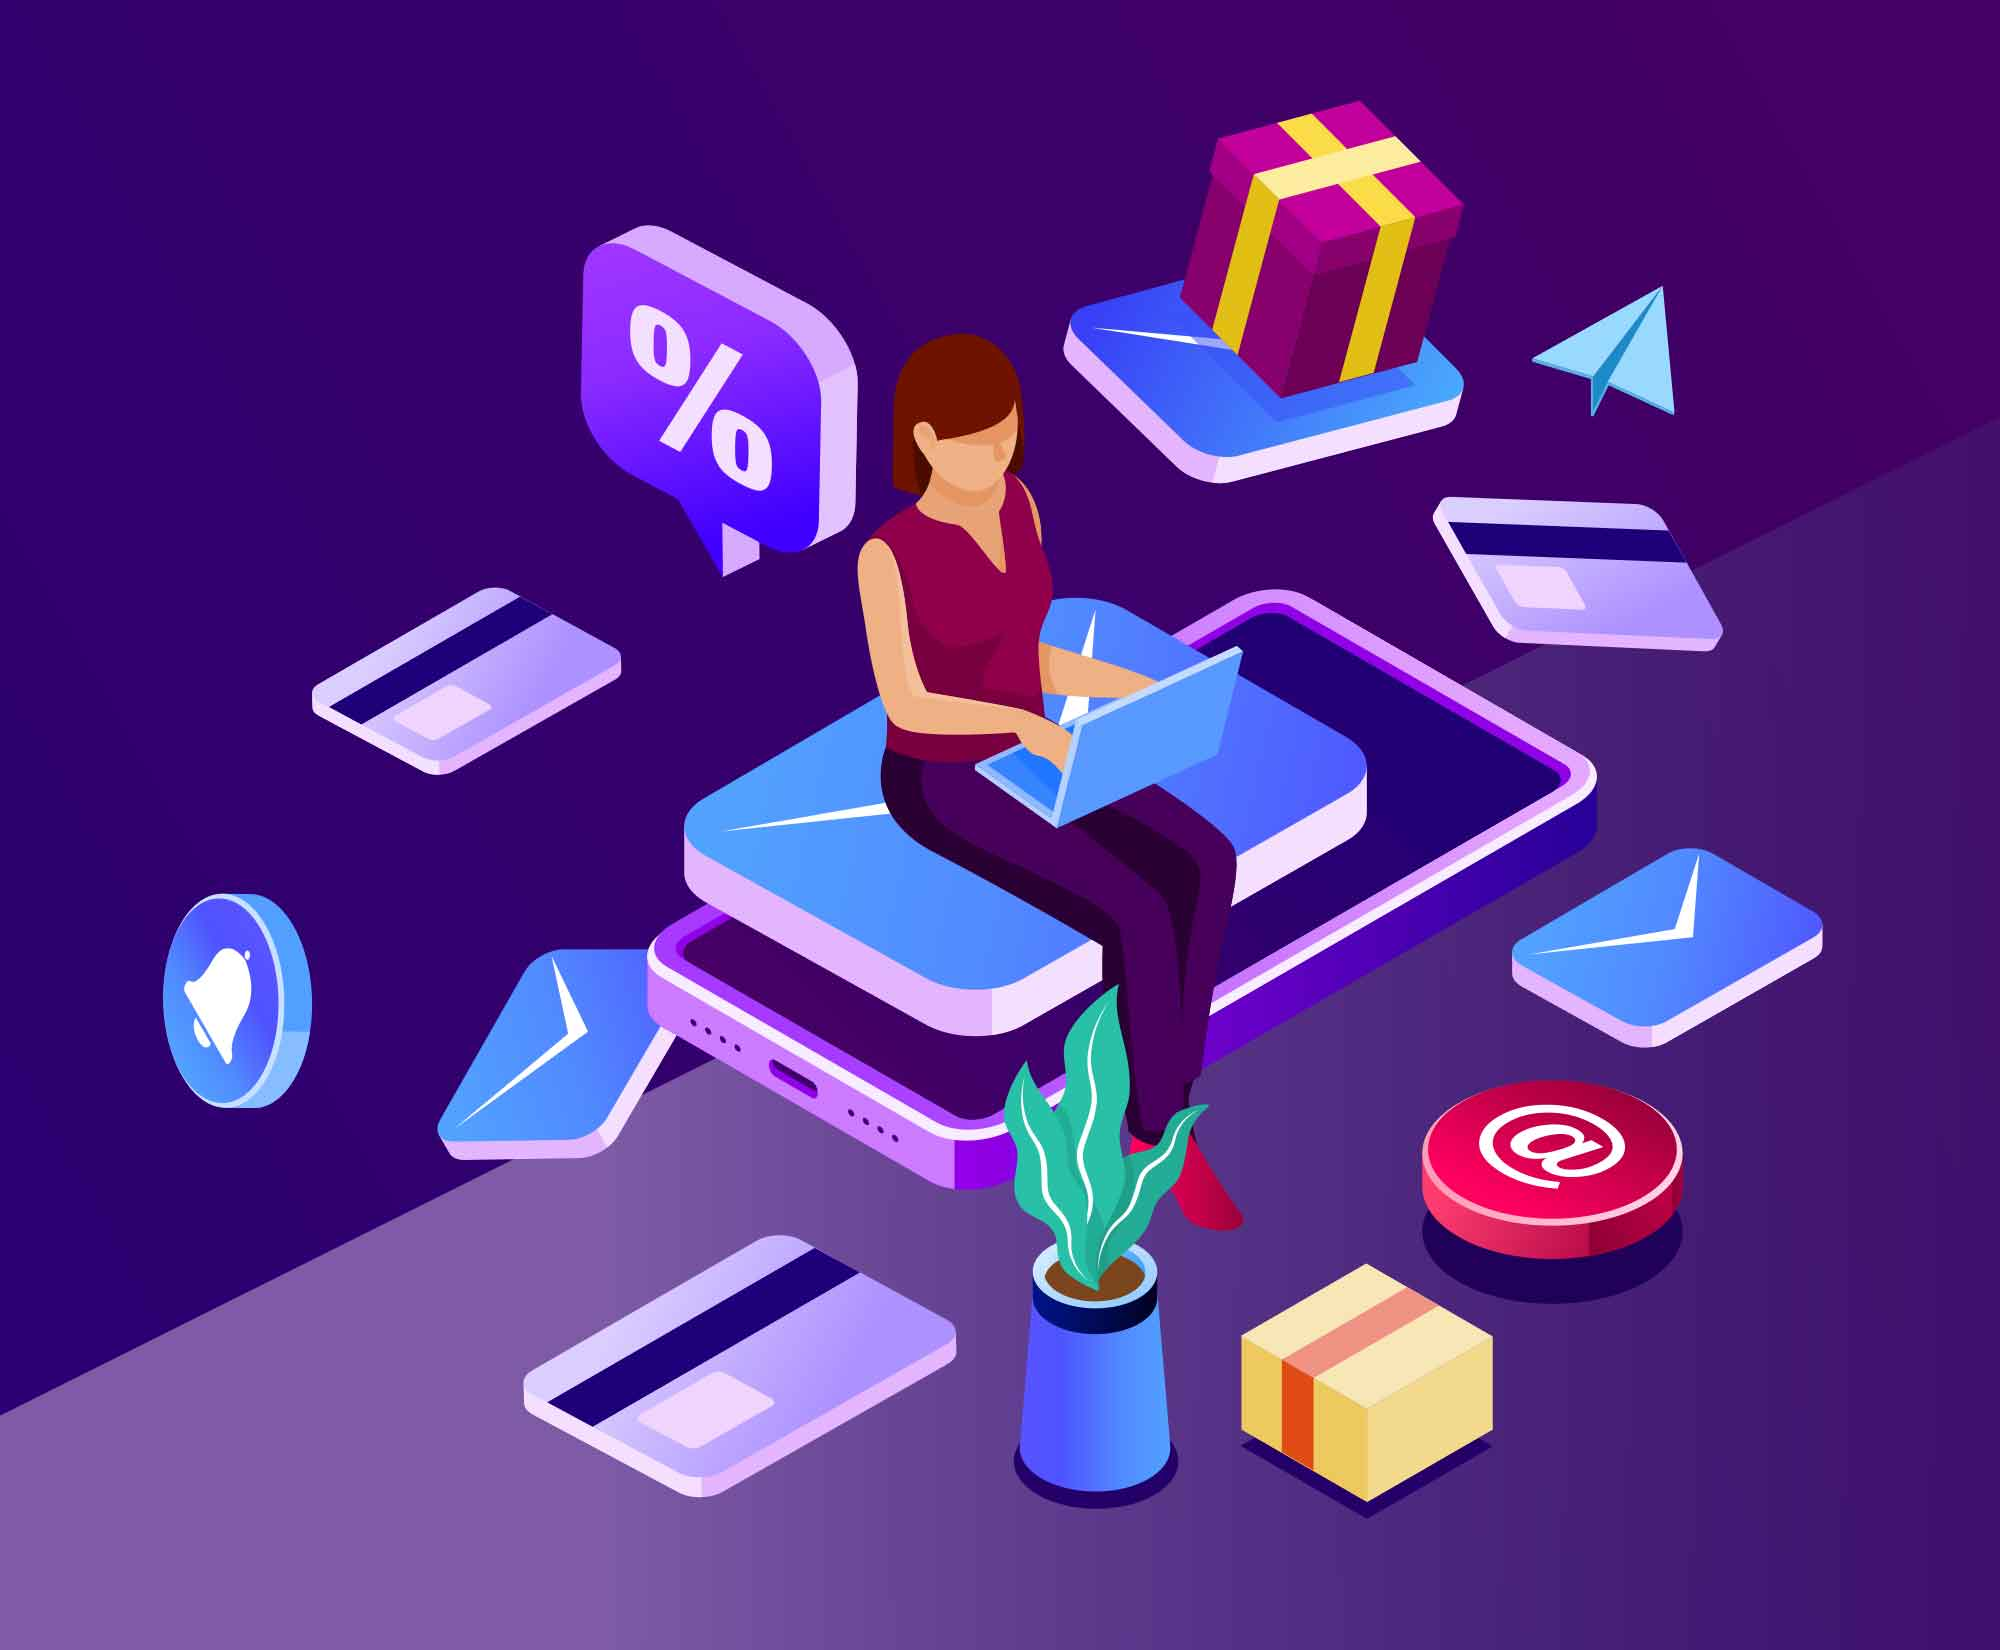 Email Marketing Illustration 2